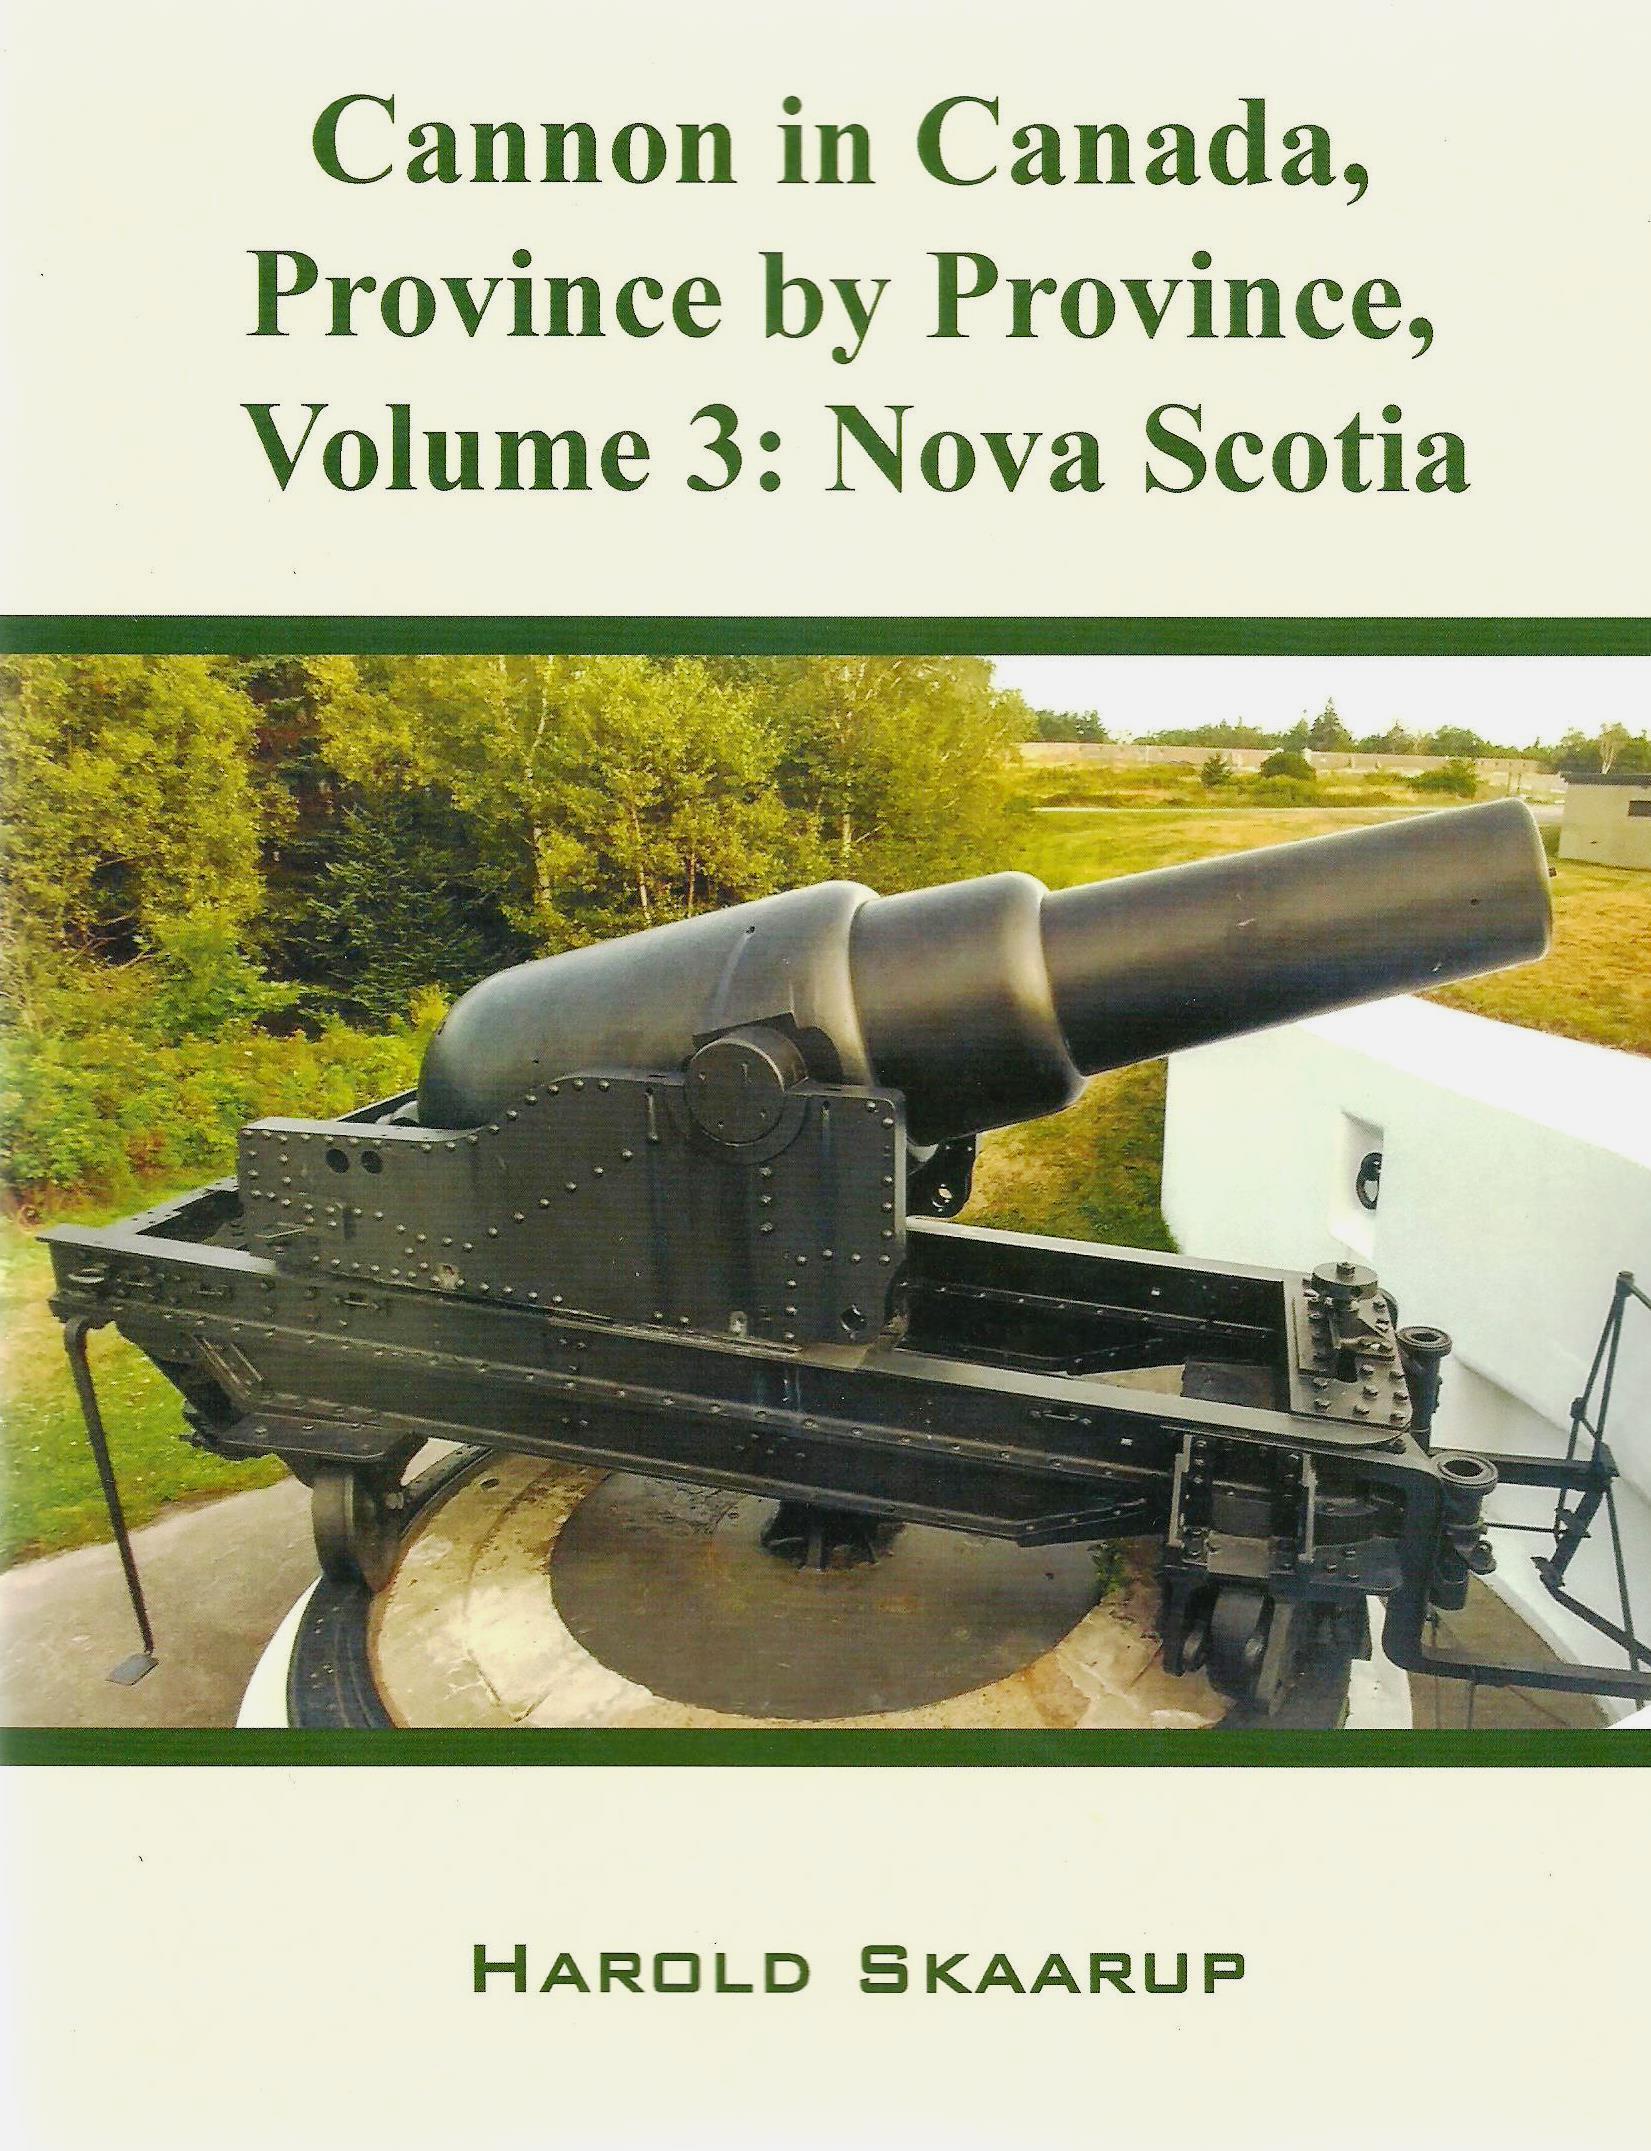 Cannon in Canada, Province by Province, Volume 3: Nova Scotia